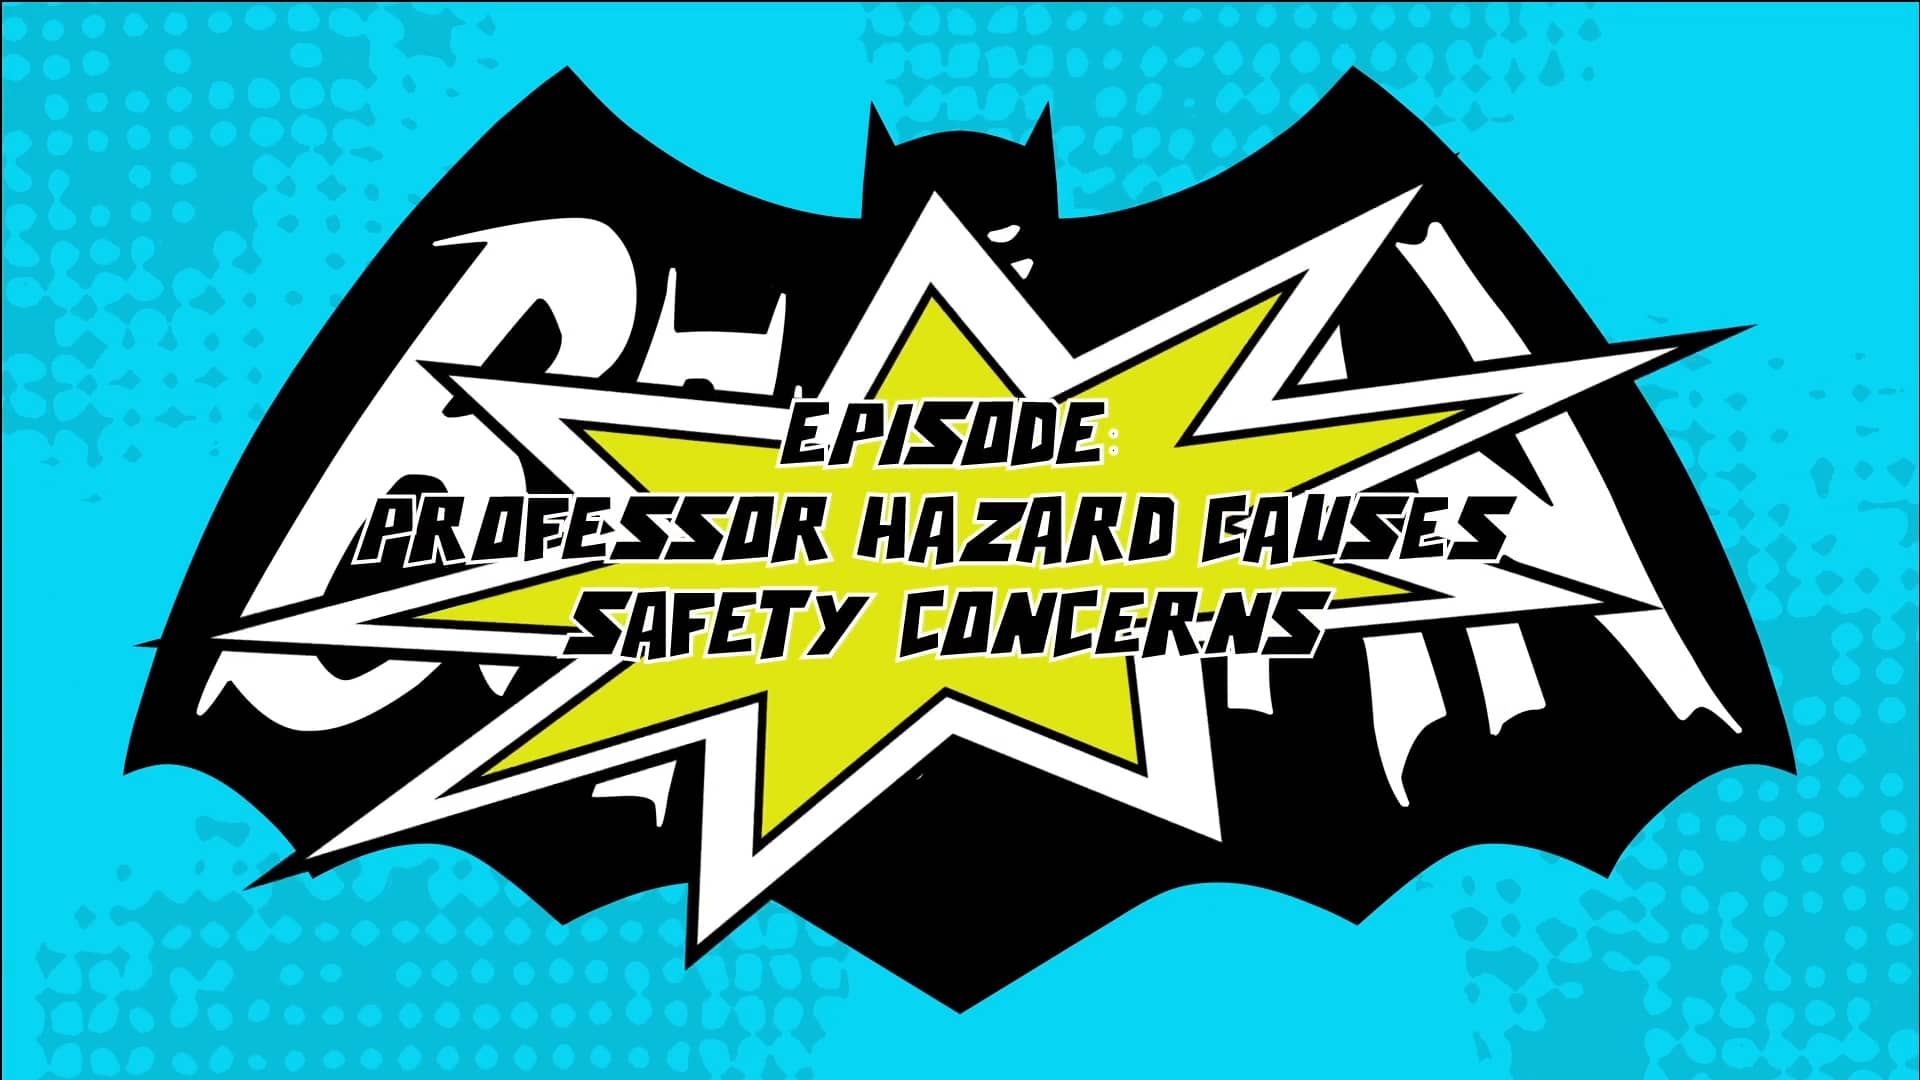 Hyatt Regency Minneapolis – Safety